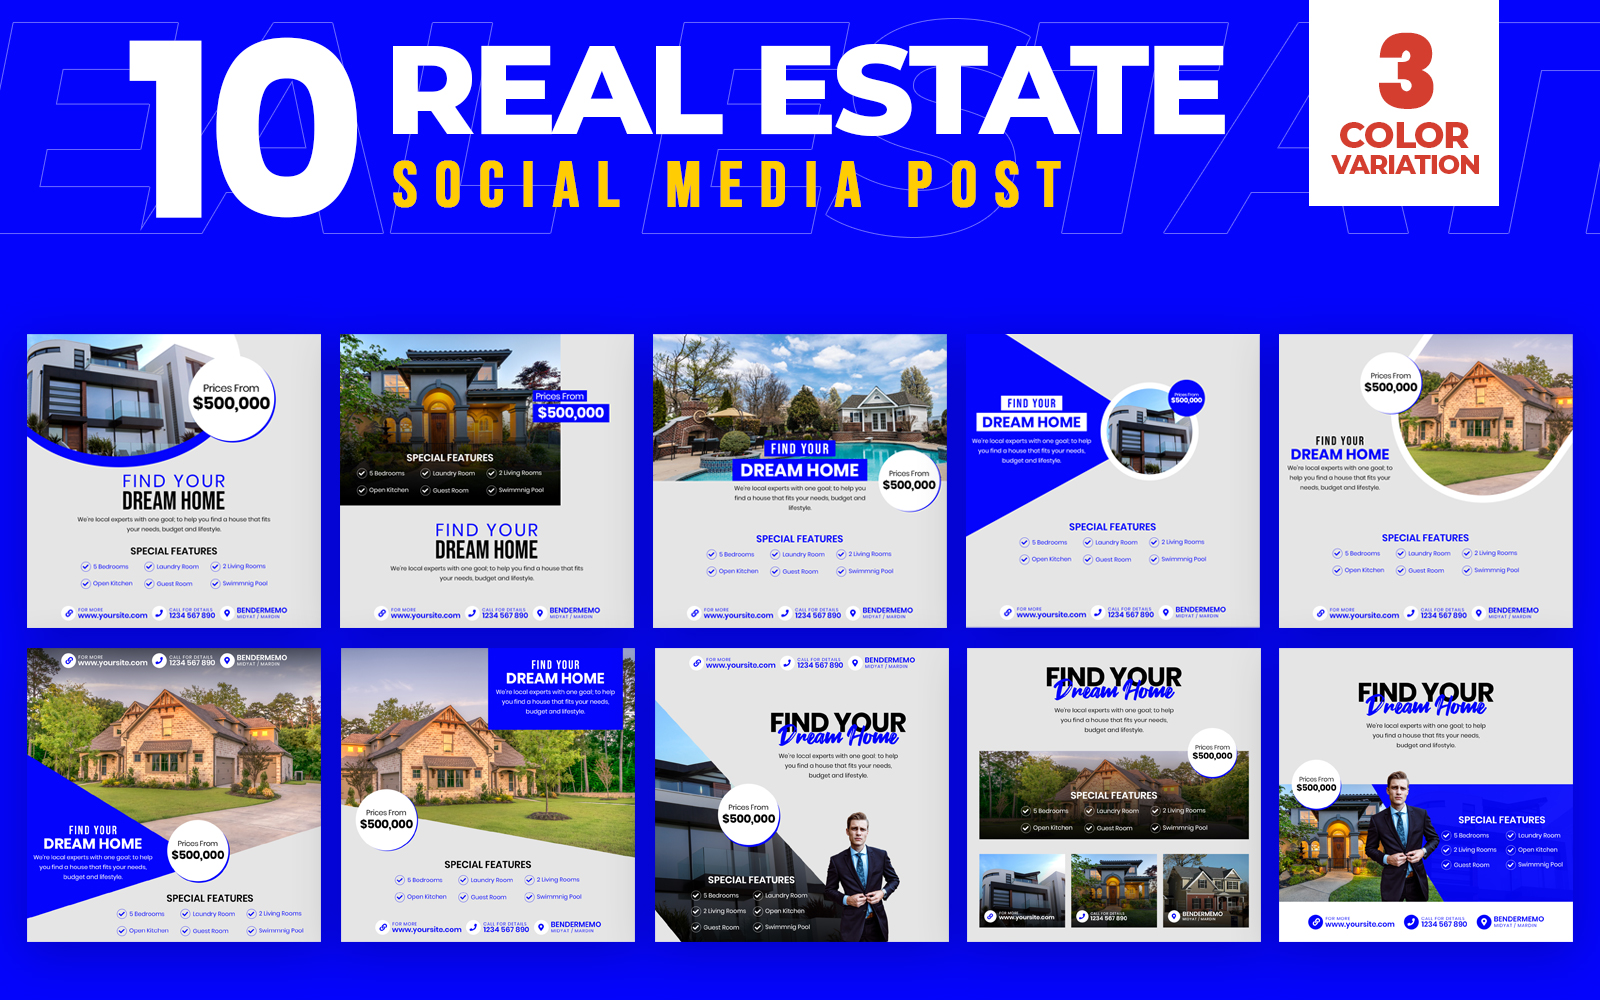 Real Estate 10 Social Media